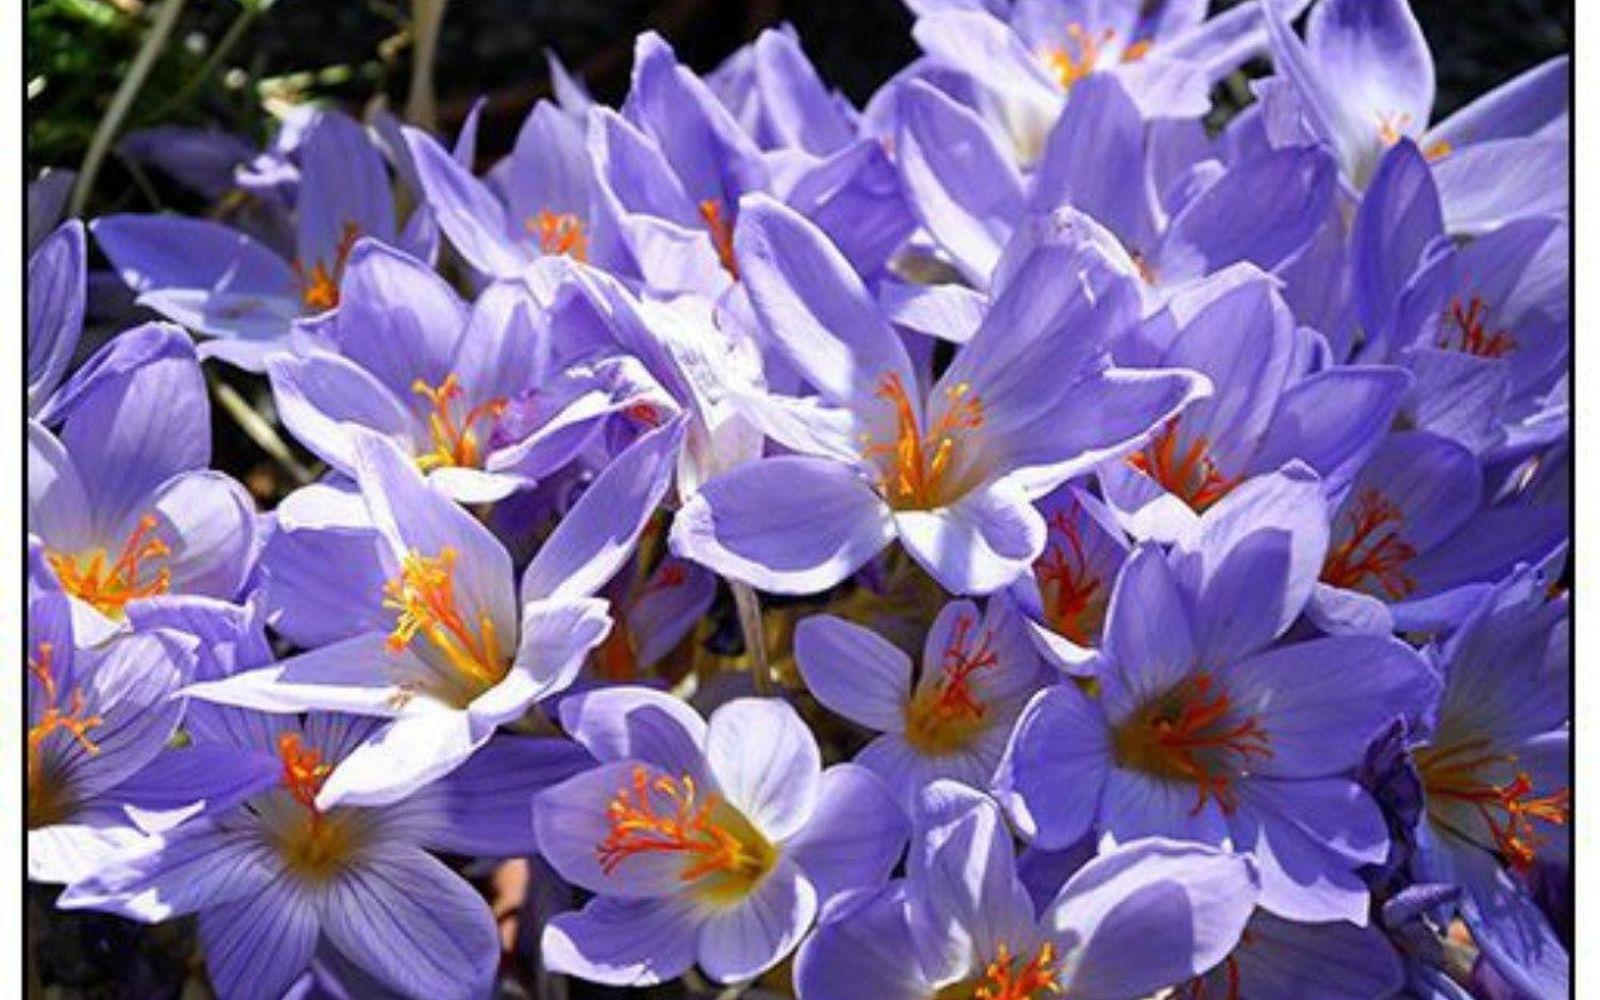 s the top 15 fall flowers everyone is loving this season, gardening, 7 Fall Crocus